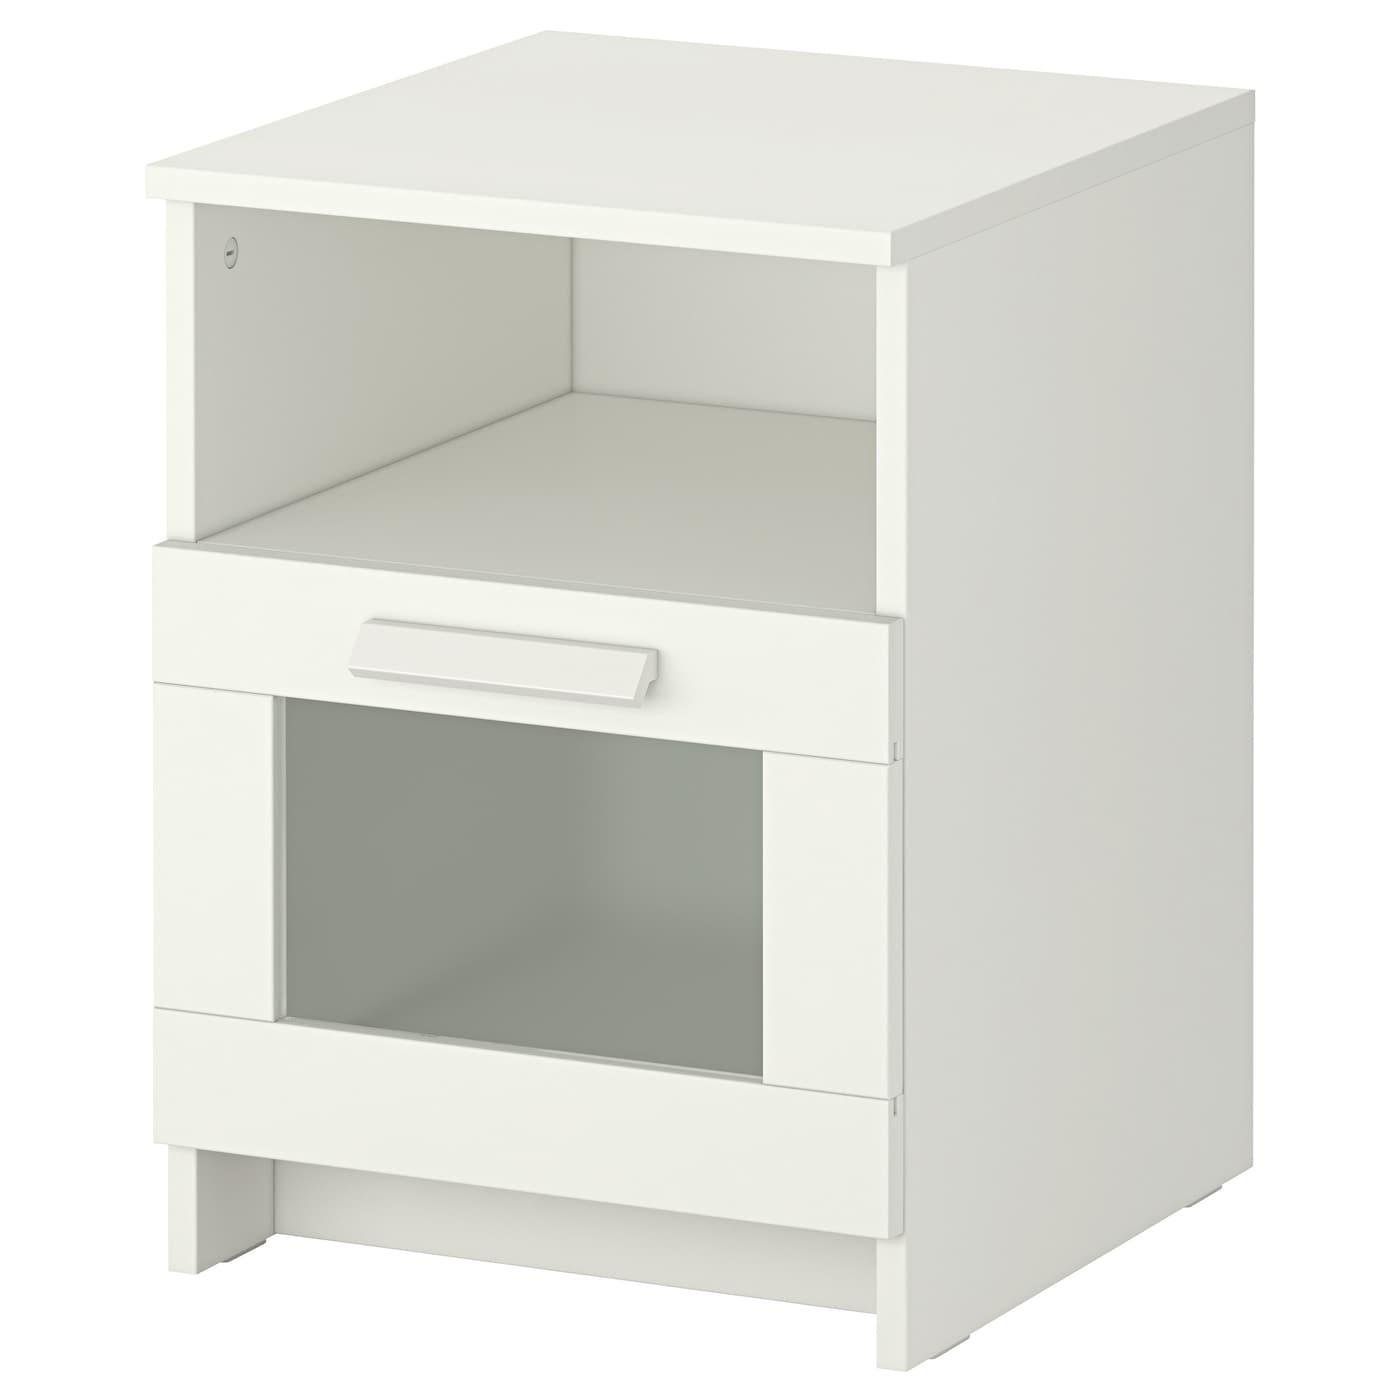 brimnes s rie ikea. Black Bedroom Furniture Sets. Home Design Ideas